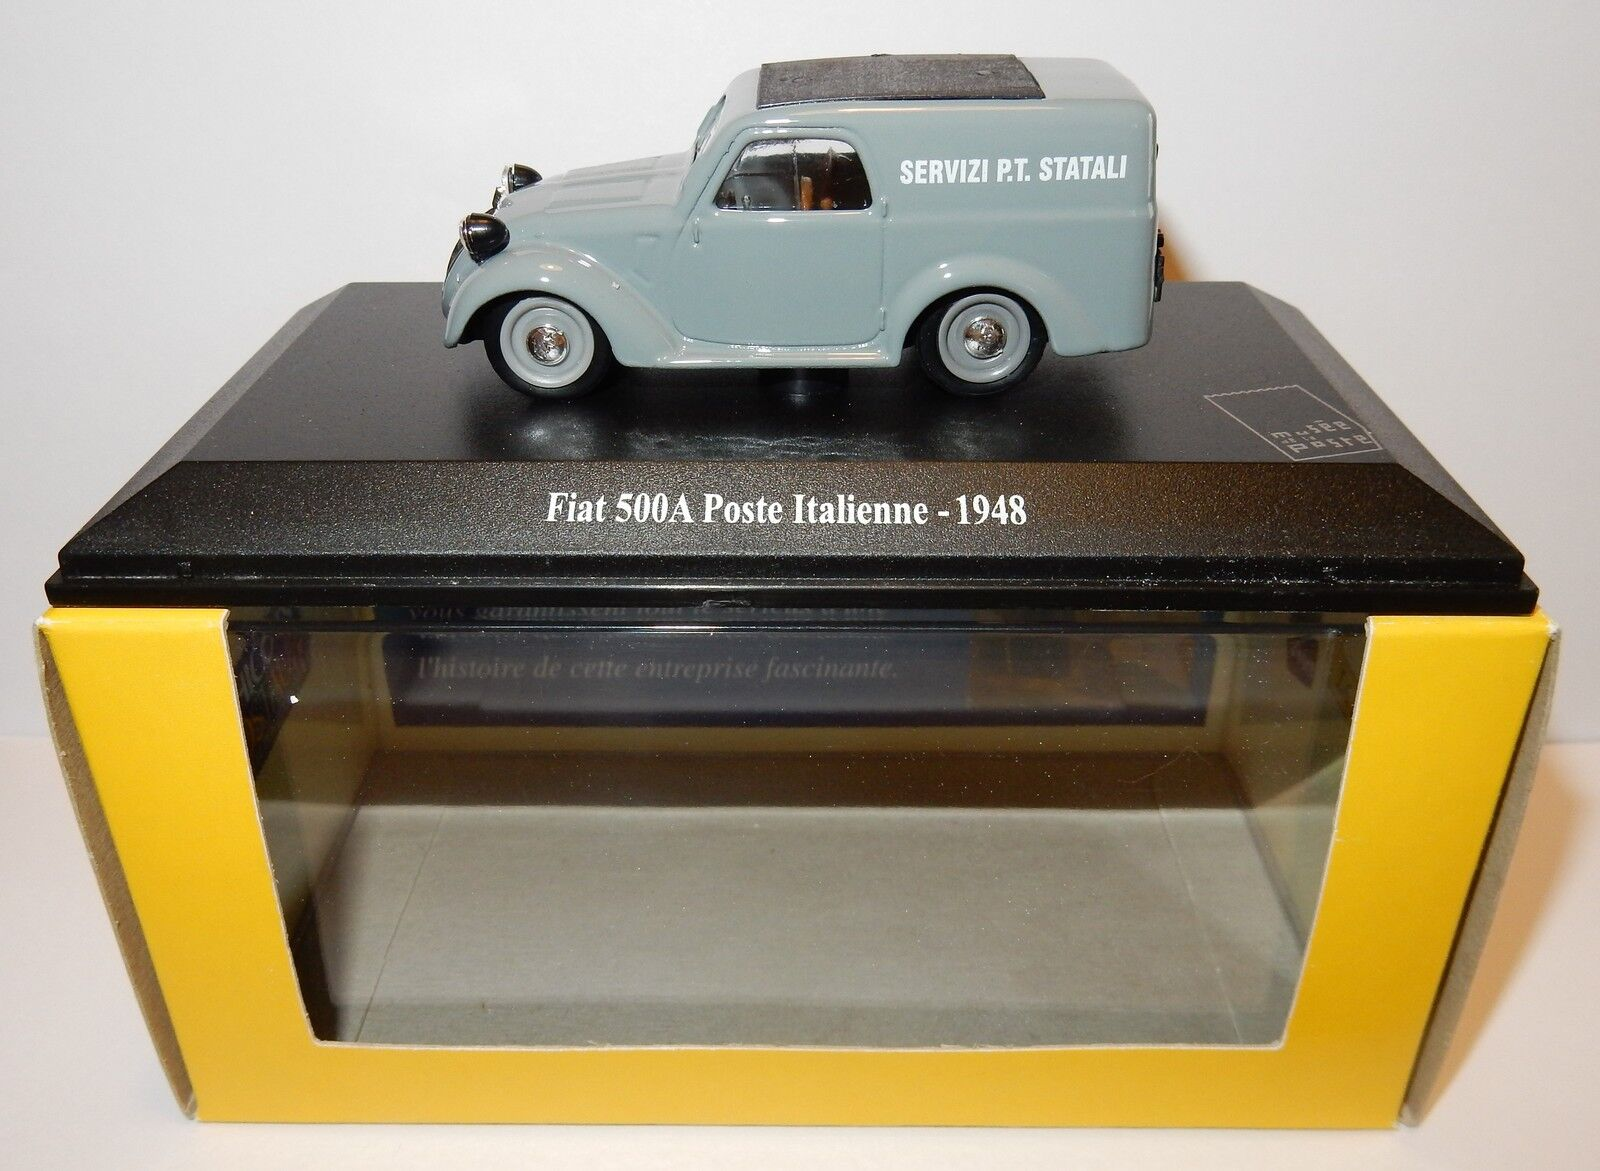 Seltene universal hobbys fiat 500 ein italienne 1948 postes post ptt - 1   43 luxe box